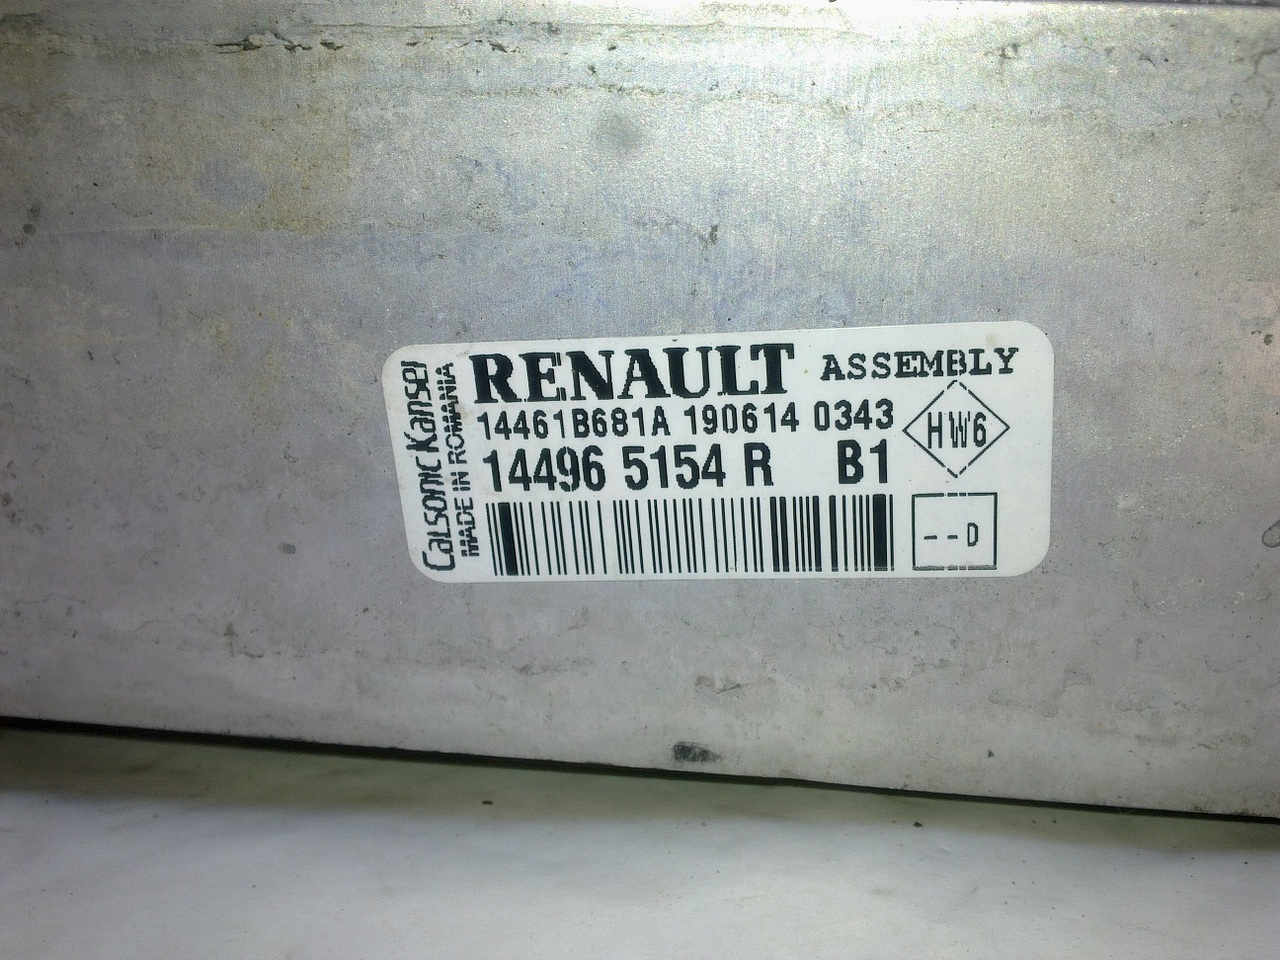 Vand intercooler Dacia Logan 2014 Renault Clio 4